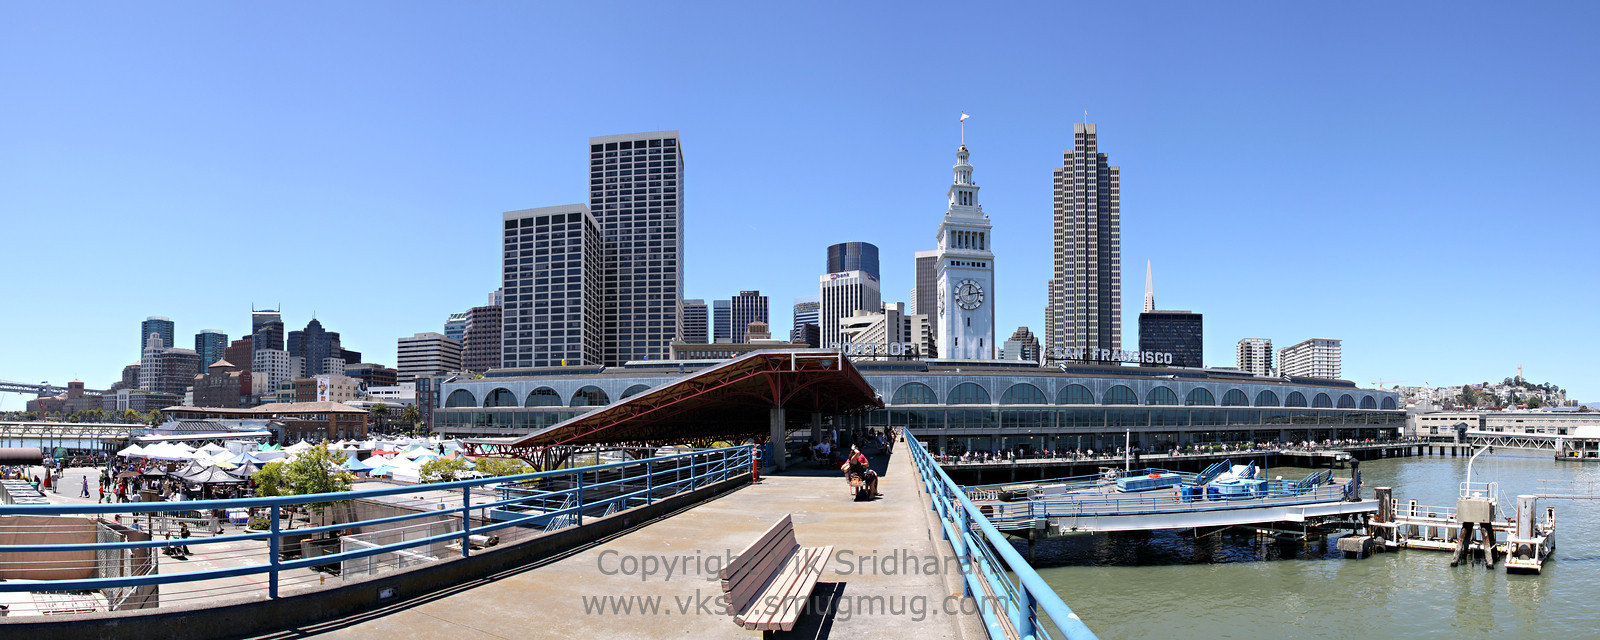 http://www.vksphoto.com/CitiesBuildingsetc/Panoramas/i-c3TnDz2/0/X3/COMPOSITE2%206-29-13-X3.jpg